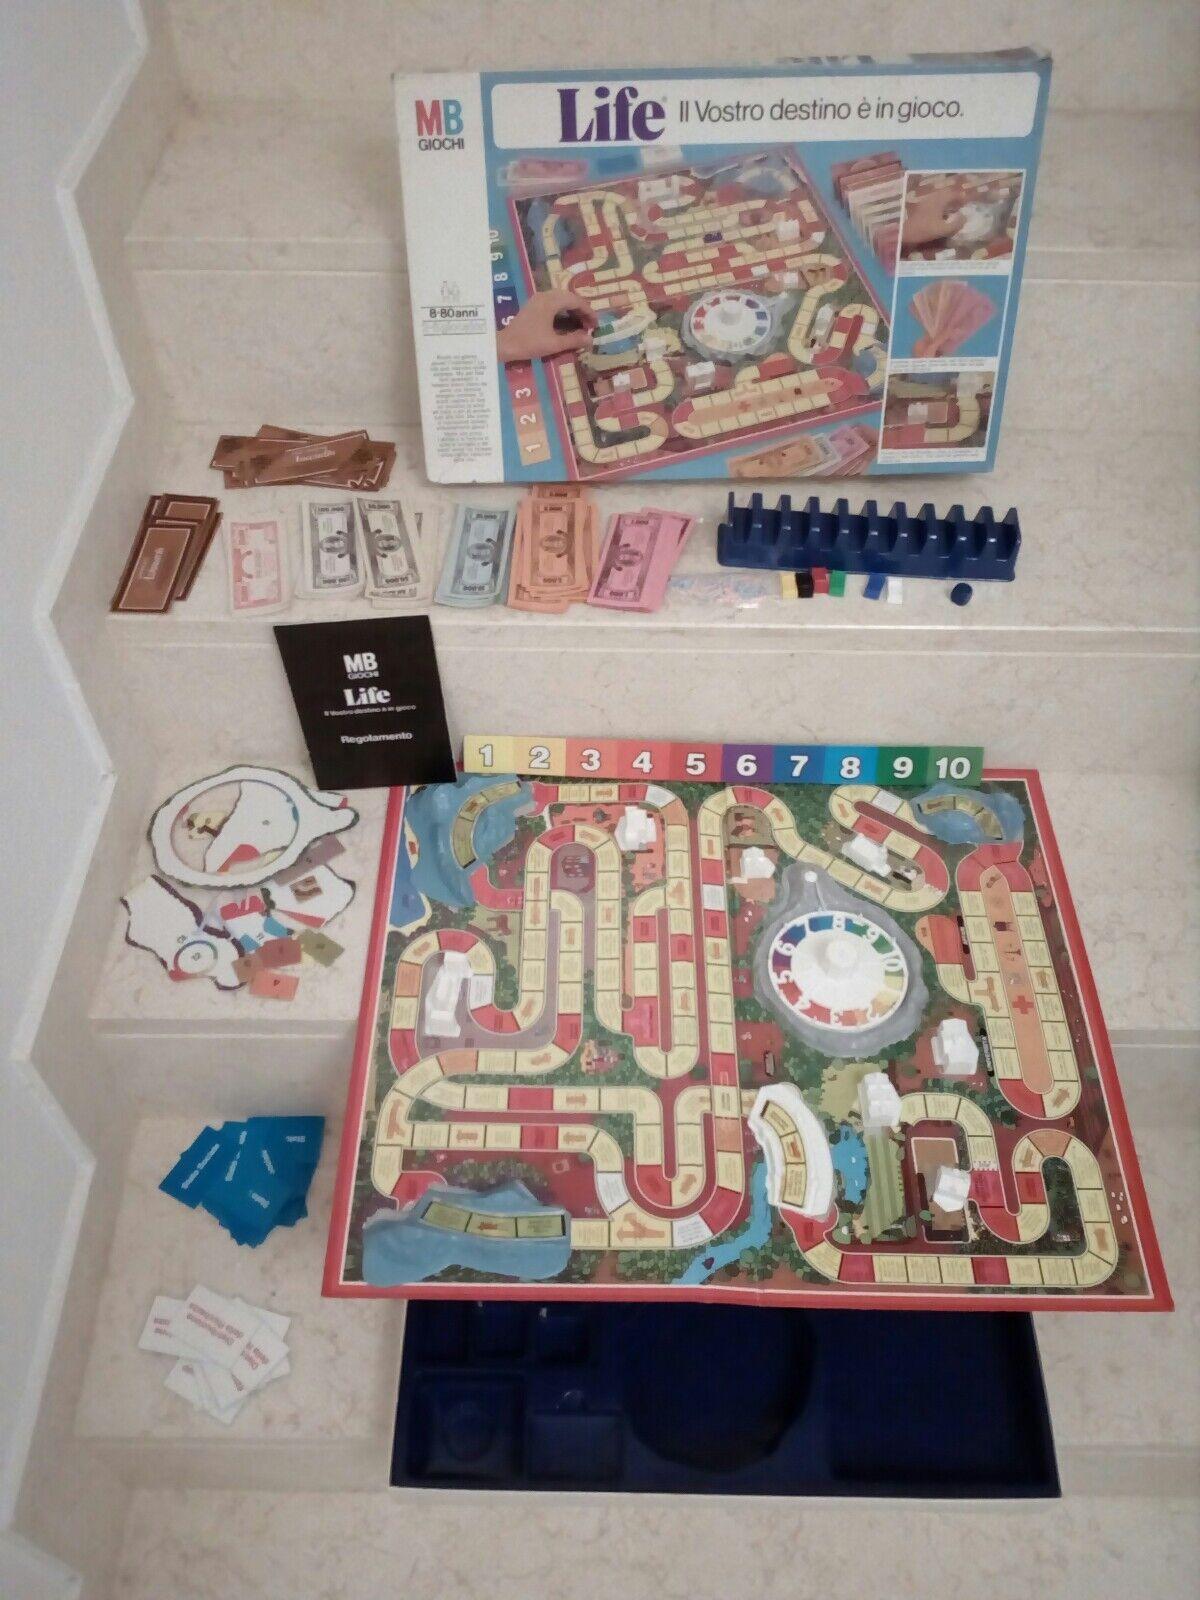 Venta barata RARO vintage collezione gioco scatola scatola scatola LIFE destino traguardi 1980 MB  diseñador en linea